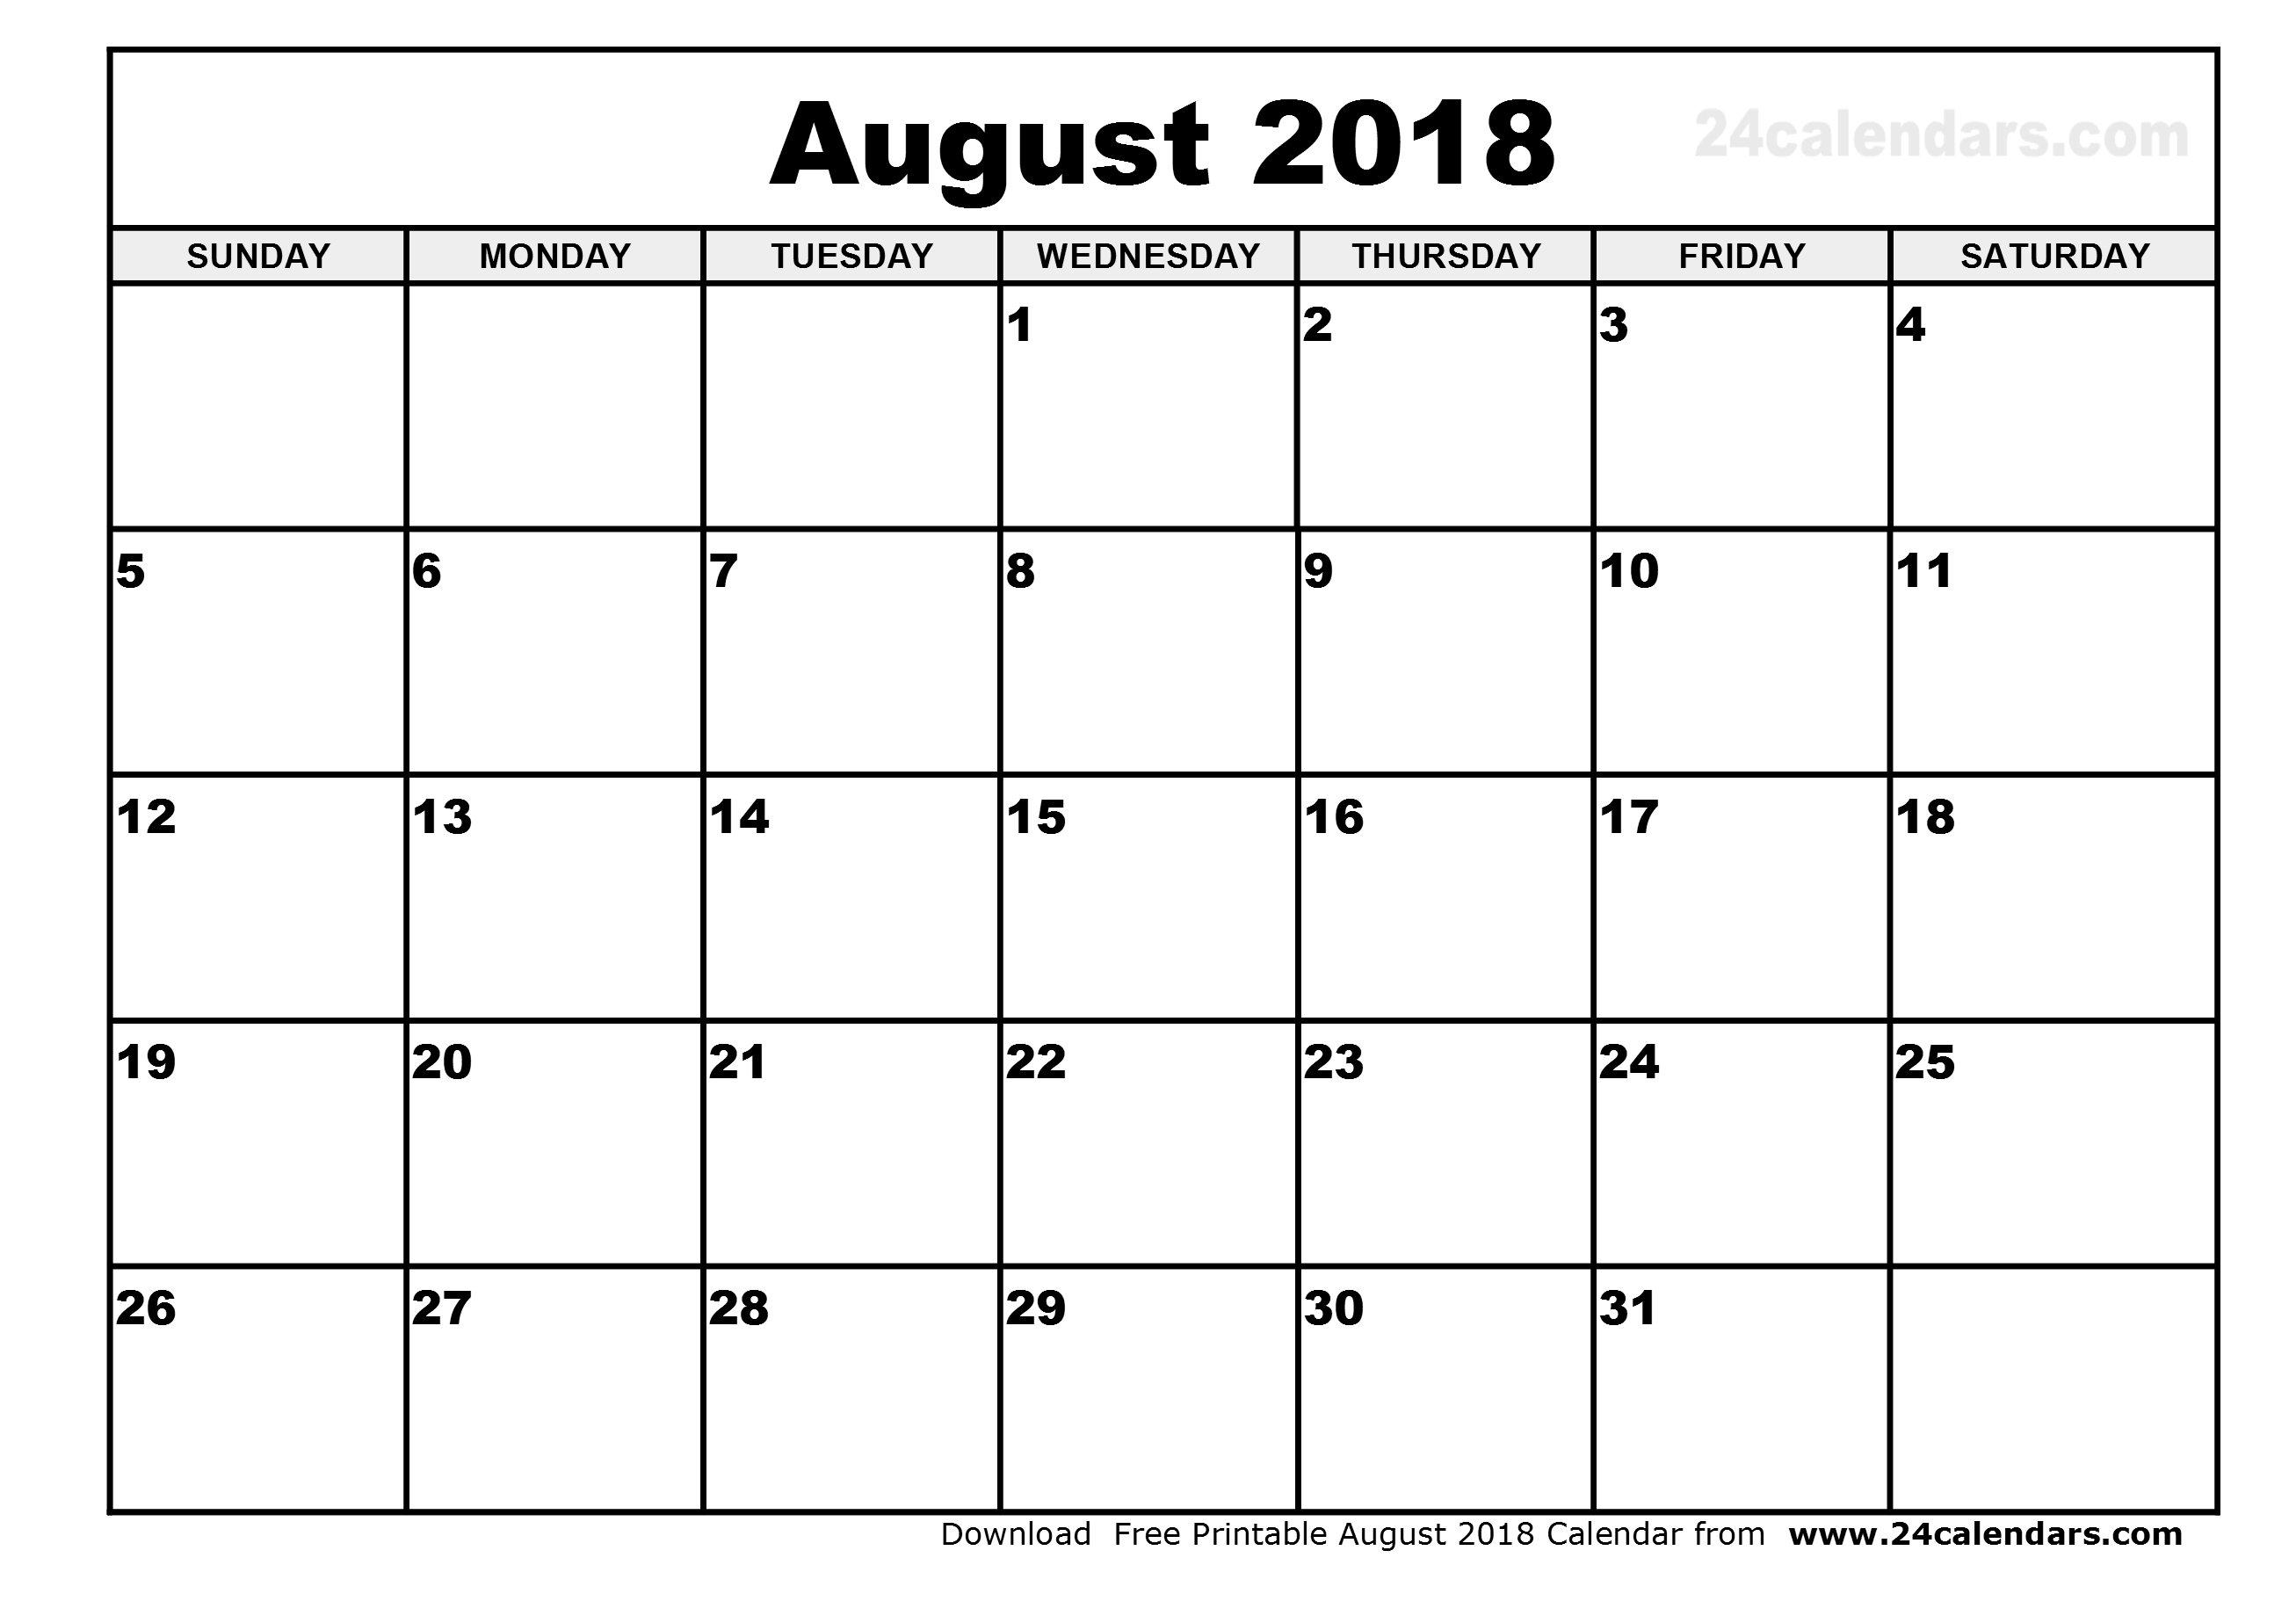 August 2018 Calendar Printable Cute | journalingsage.com